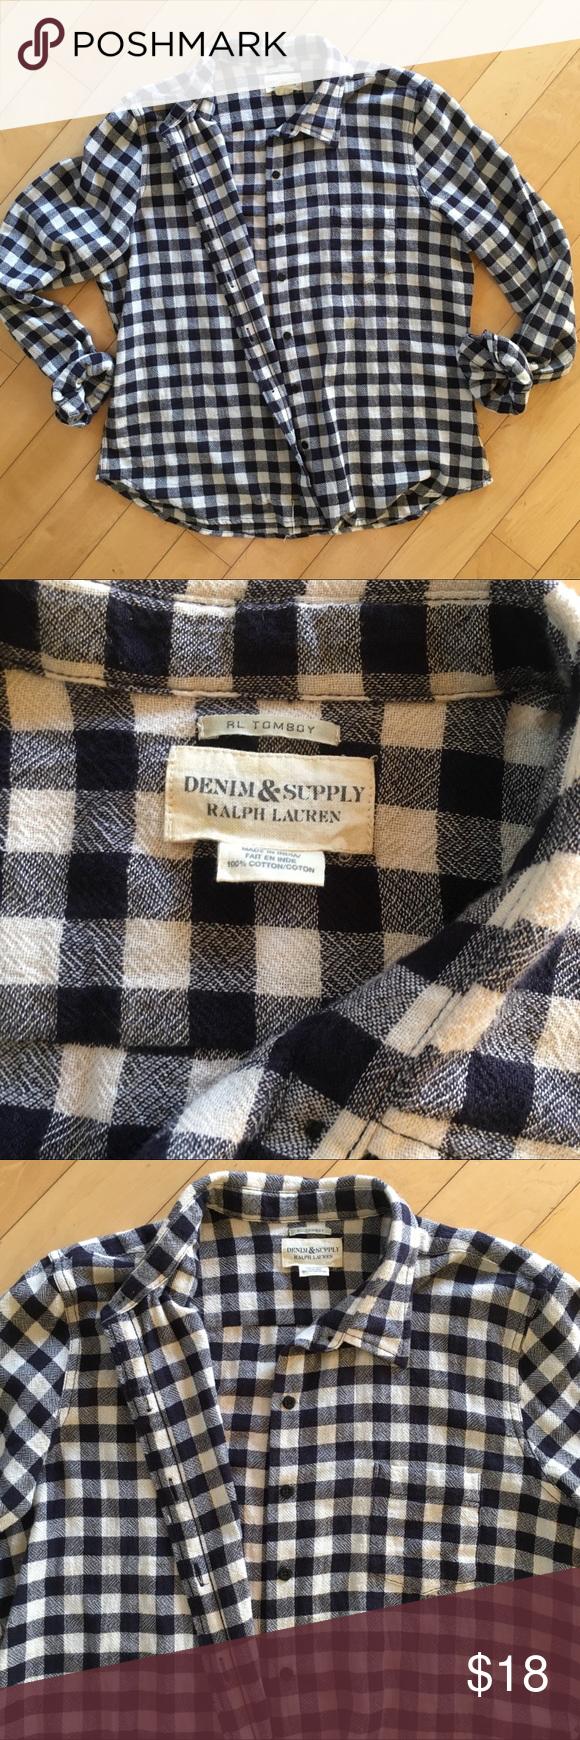 Flannel with shirt underneath  Ralph Lauren Blue u Cream Flannel  Flannels Navy and Customer support